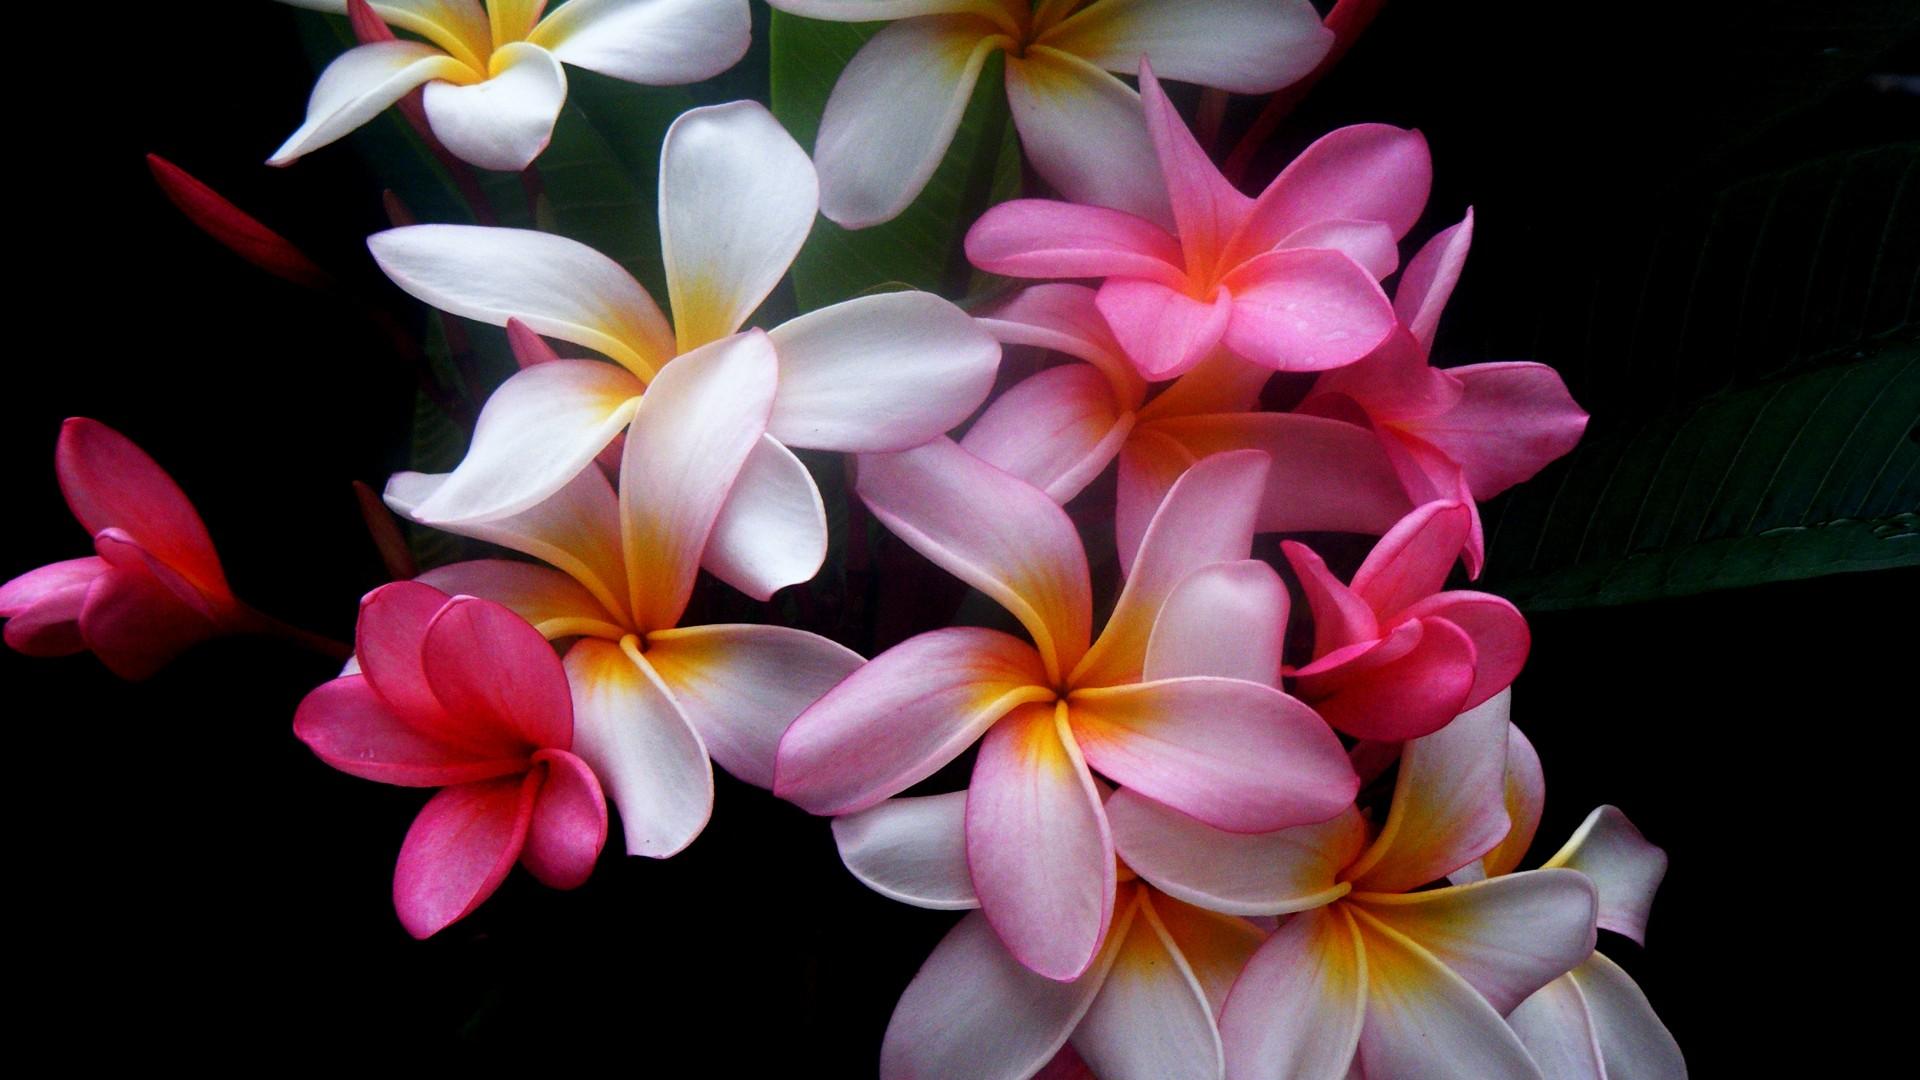 1920x1080 Beautiful flowers desktop PC and Mac wallpaper 1920x1080